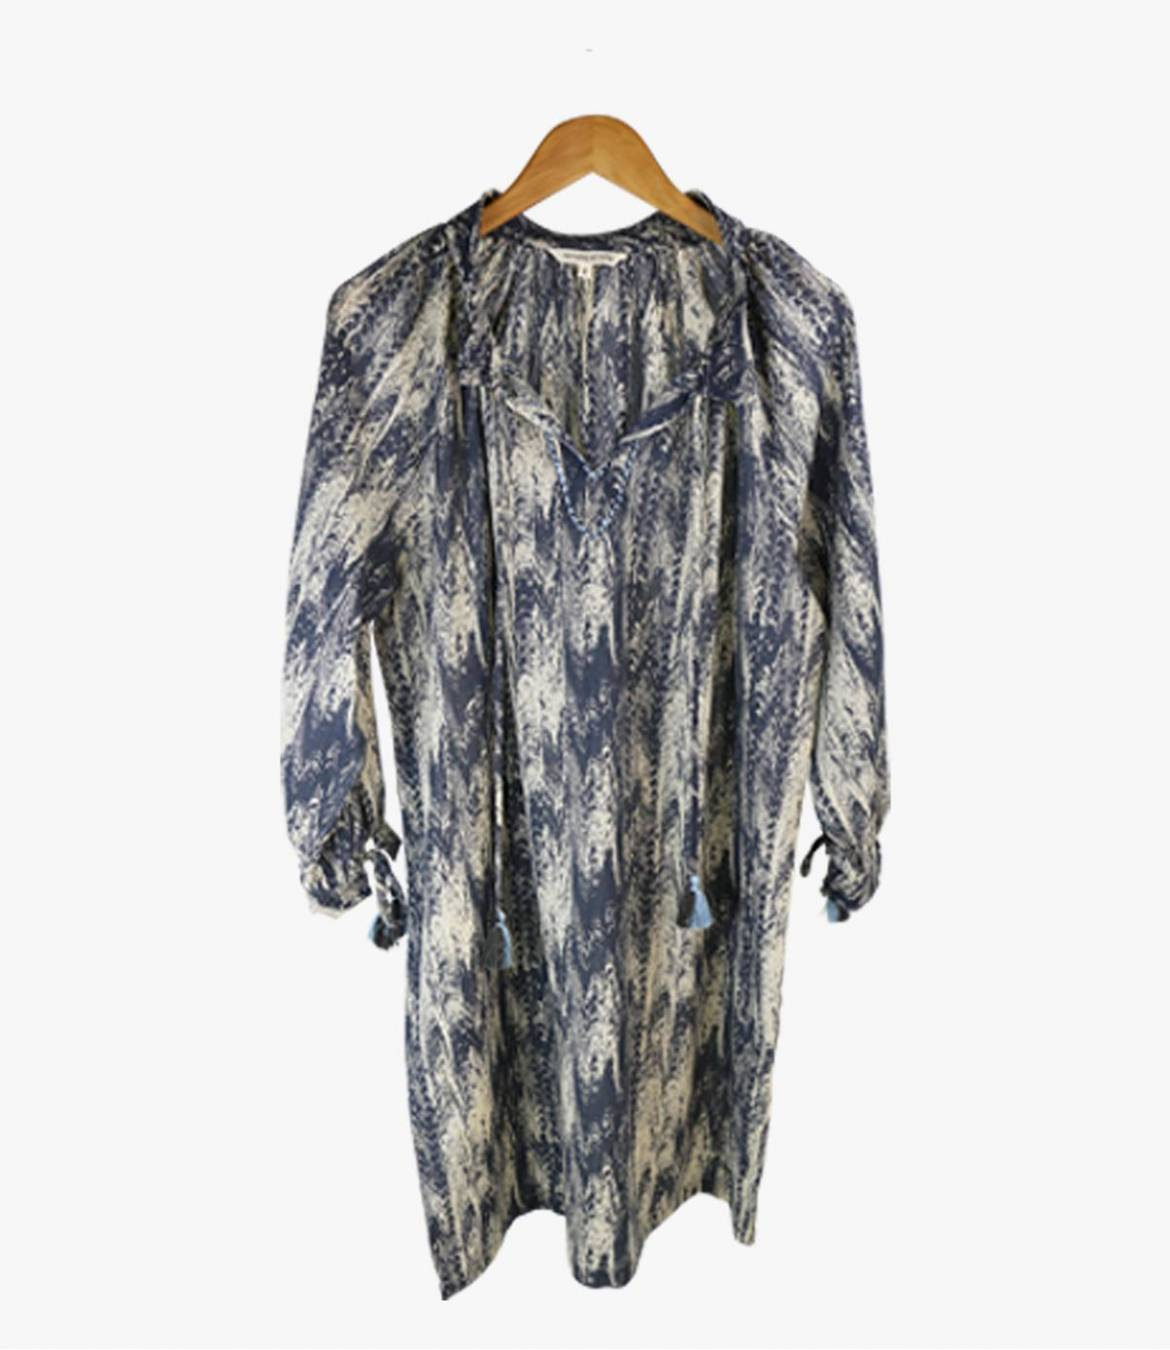 BESS MOIRA Robe en Coton pour Femme Storiatipic - 3